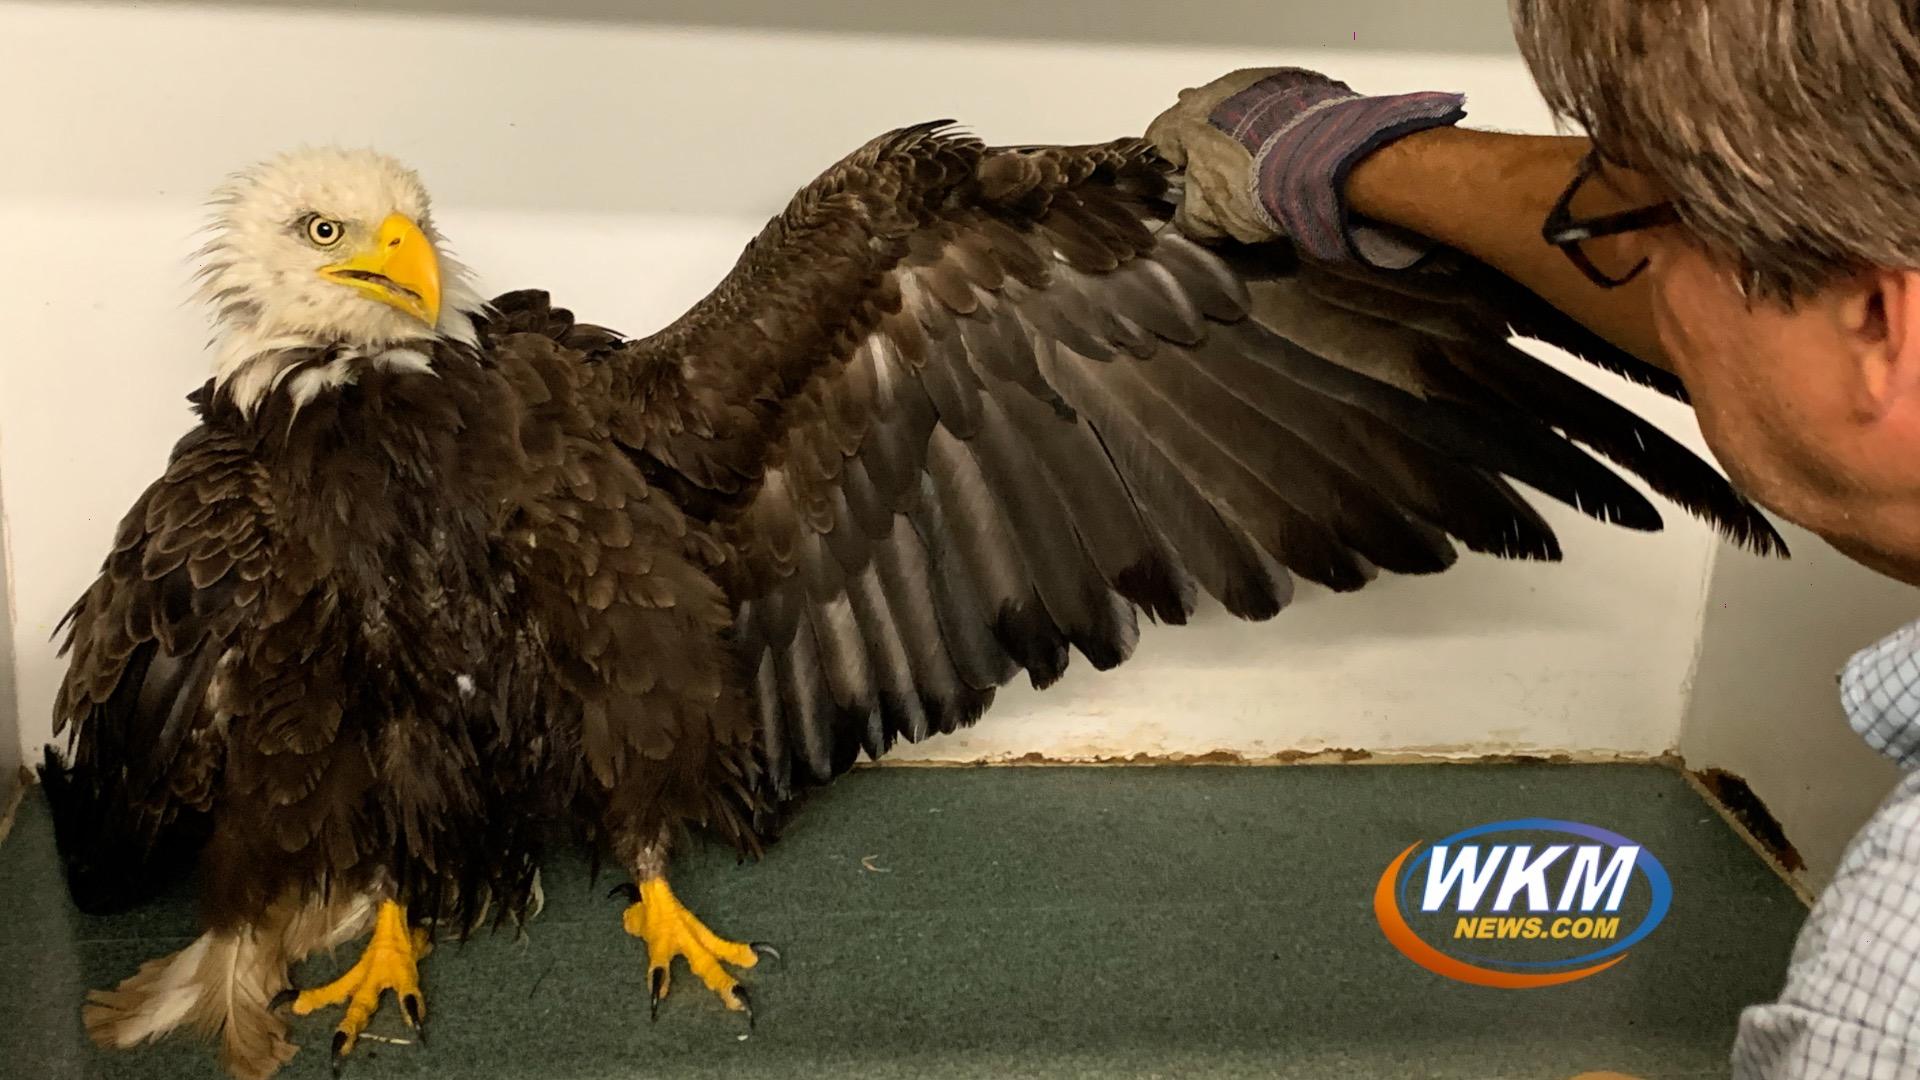 DNR Releases Rehabilitated Bald Eagle at Hardy Lake